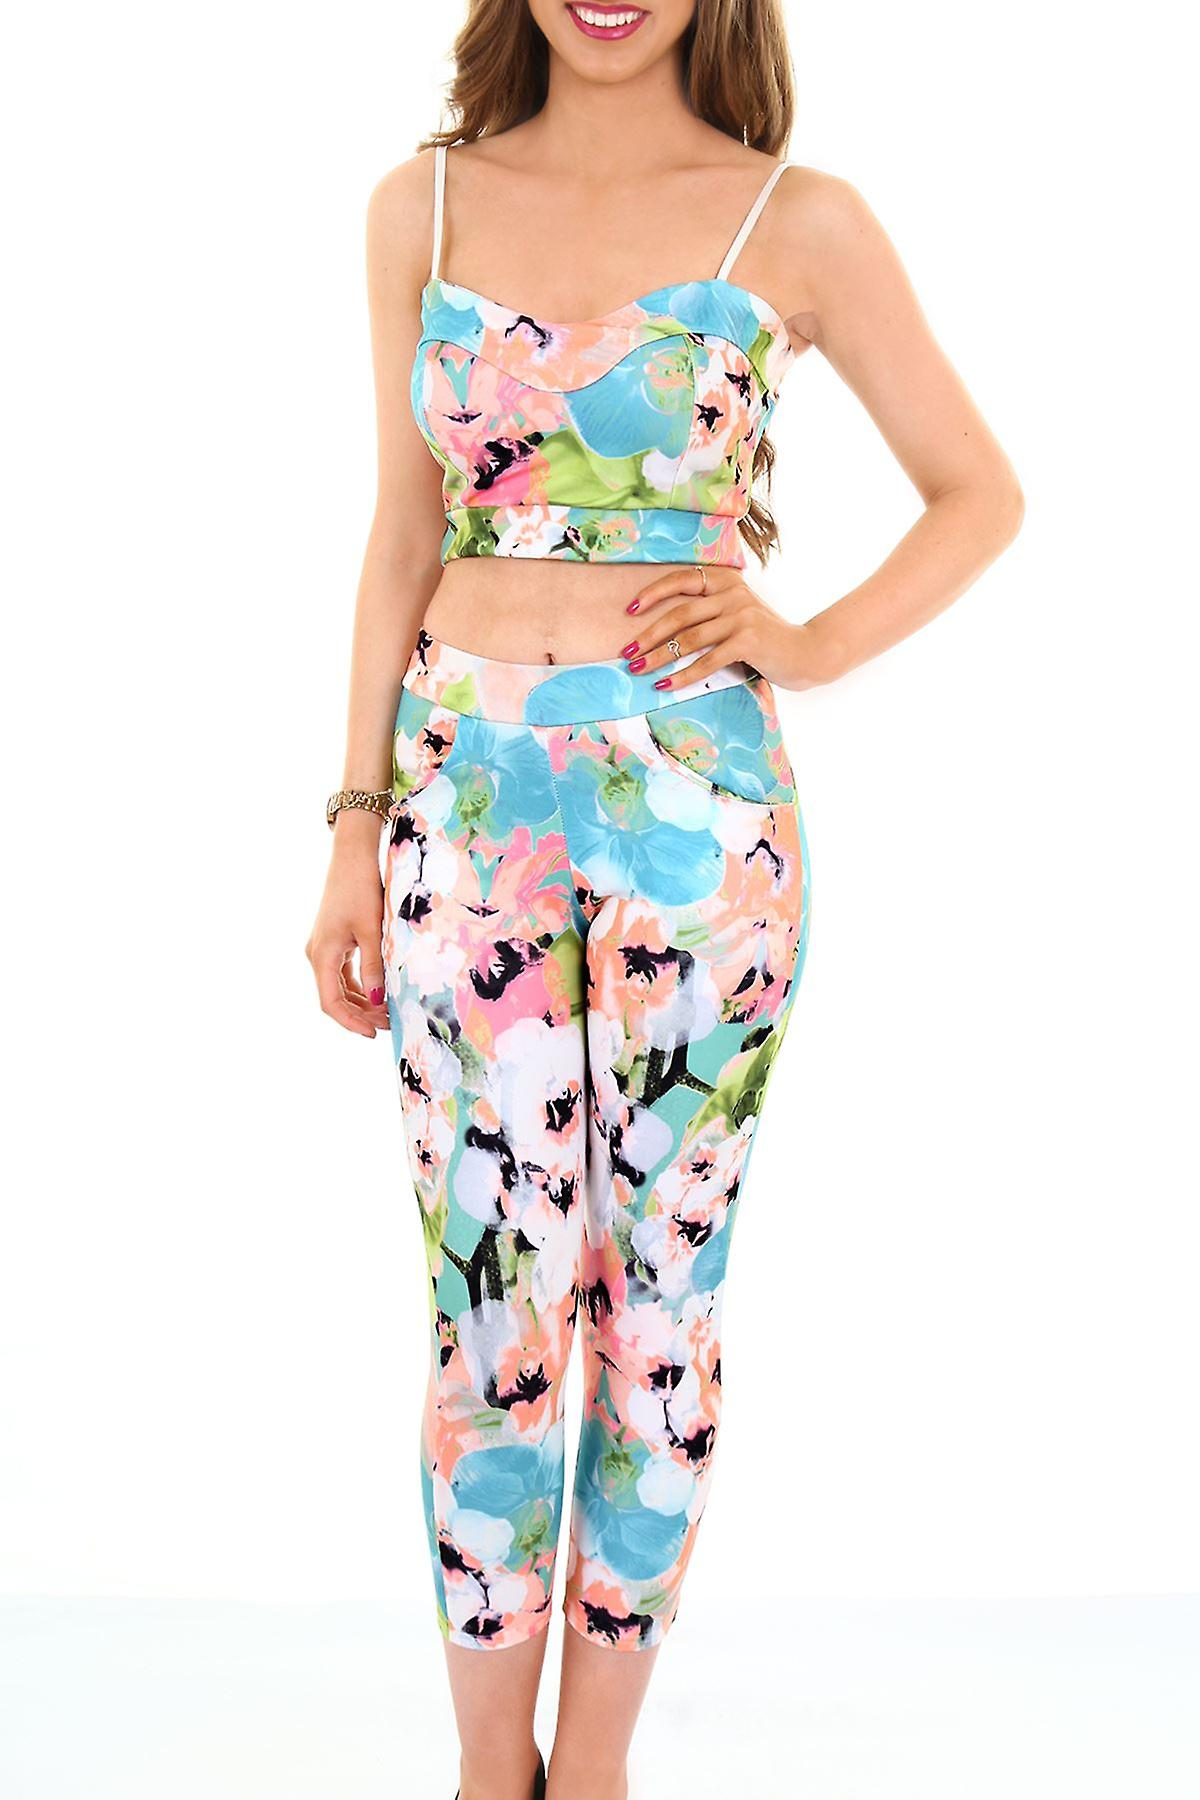 Ladies Neon Floral Flower Print Strappy Crop Top Womens 3/4 Party Leggings Set